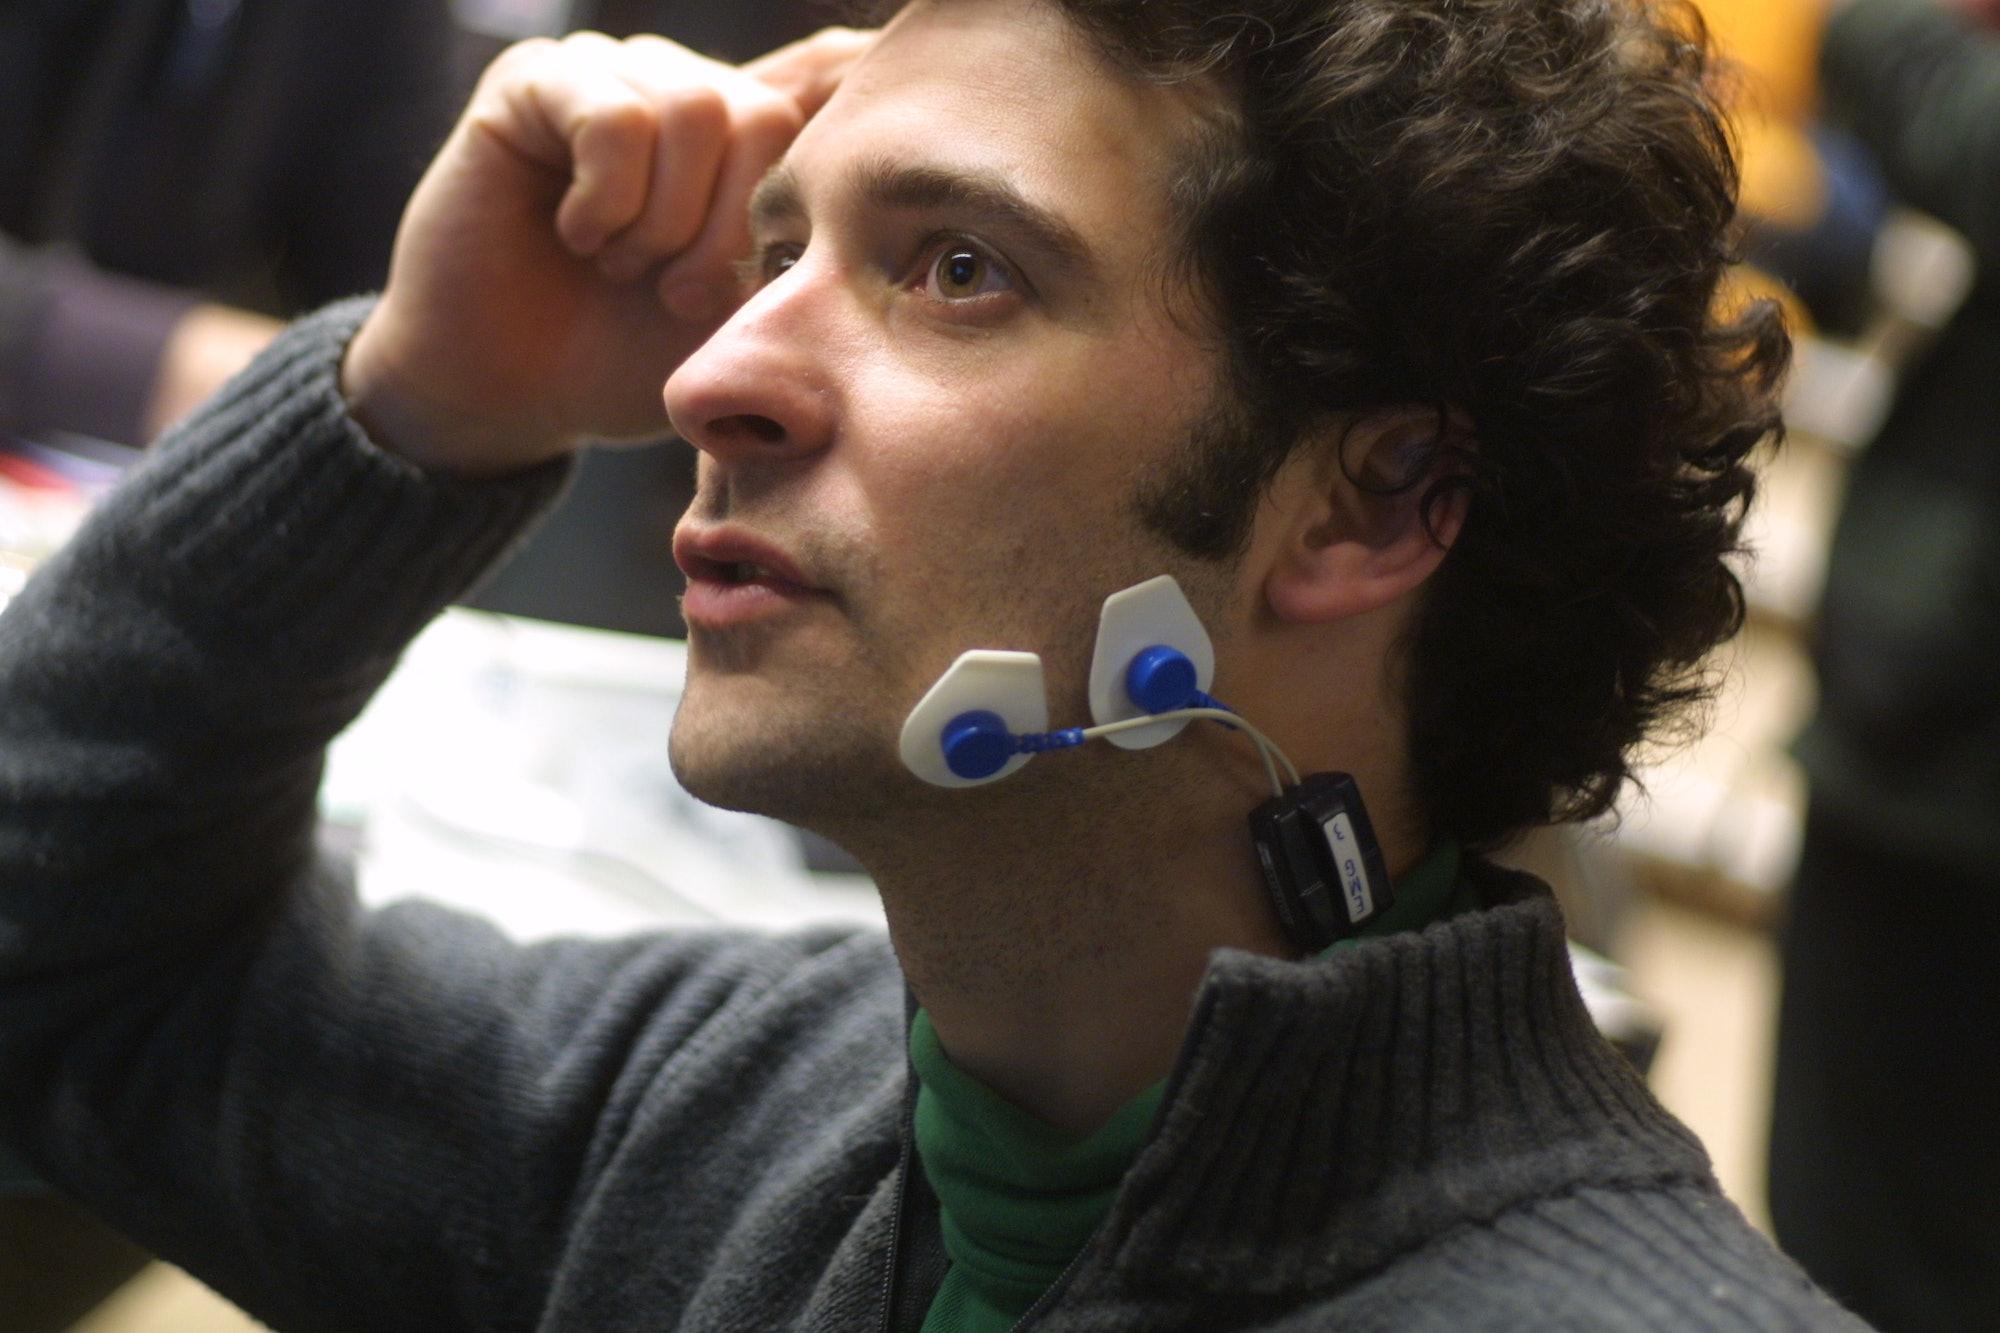 EEG, EKG, EMG, GSR and Transcranial Magnetic Stimulation @ Main d'oeuvresinsitu.lri.fr/~labrune/blog/2008/03/22/biosignals-workshop/www.noraxon.com/aurion/zerowire.phpBiosignals Workshop -  Art & Science emotions